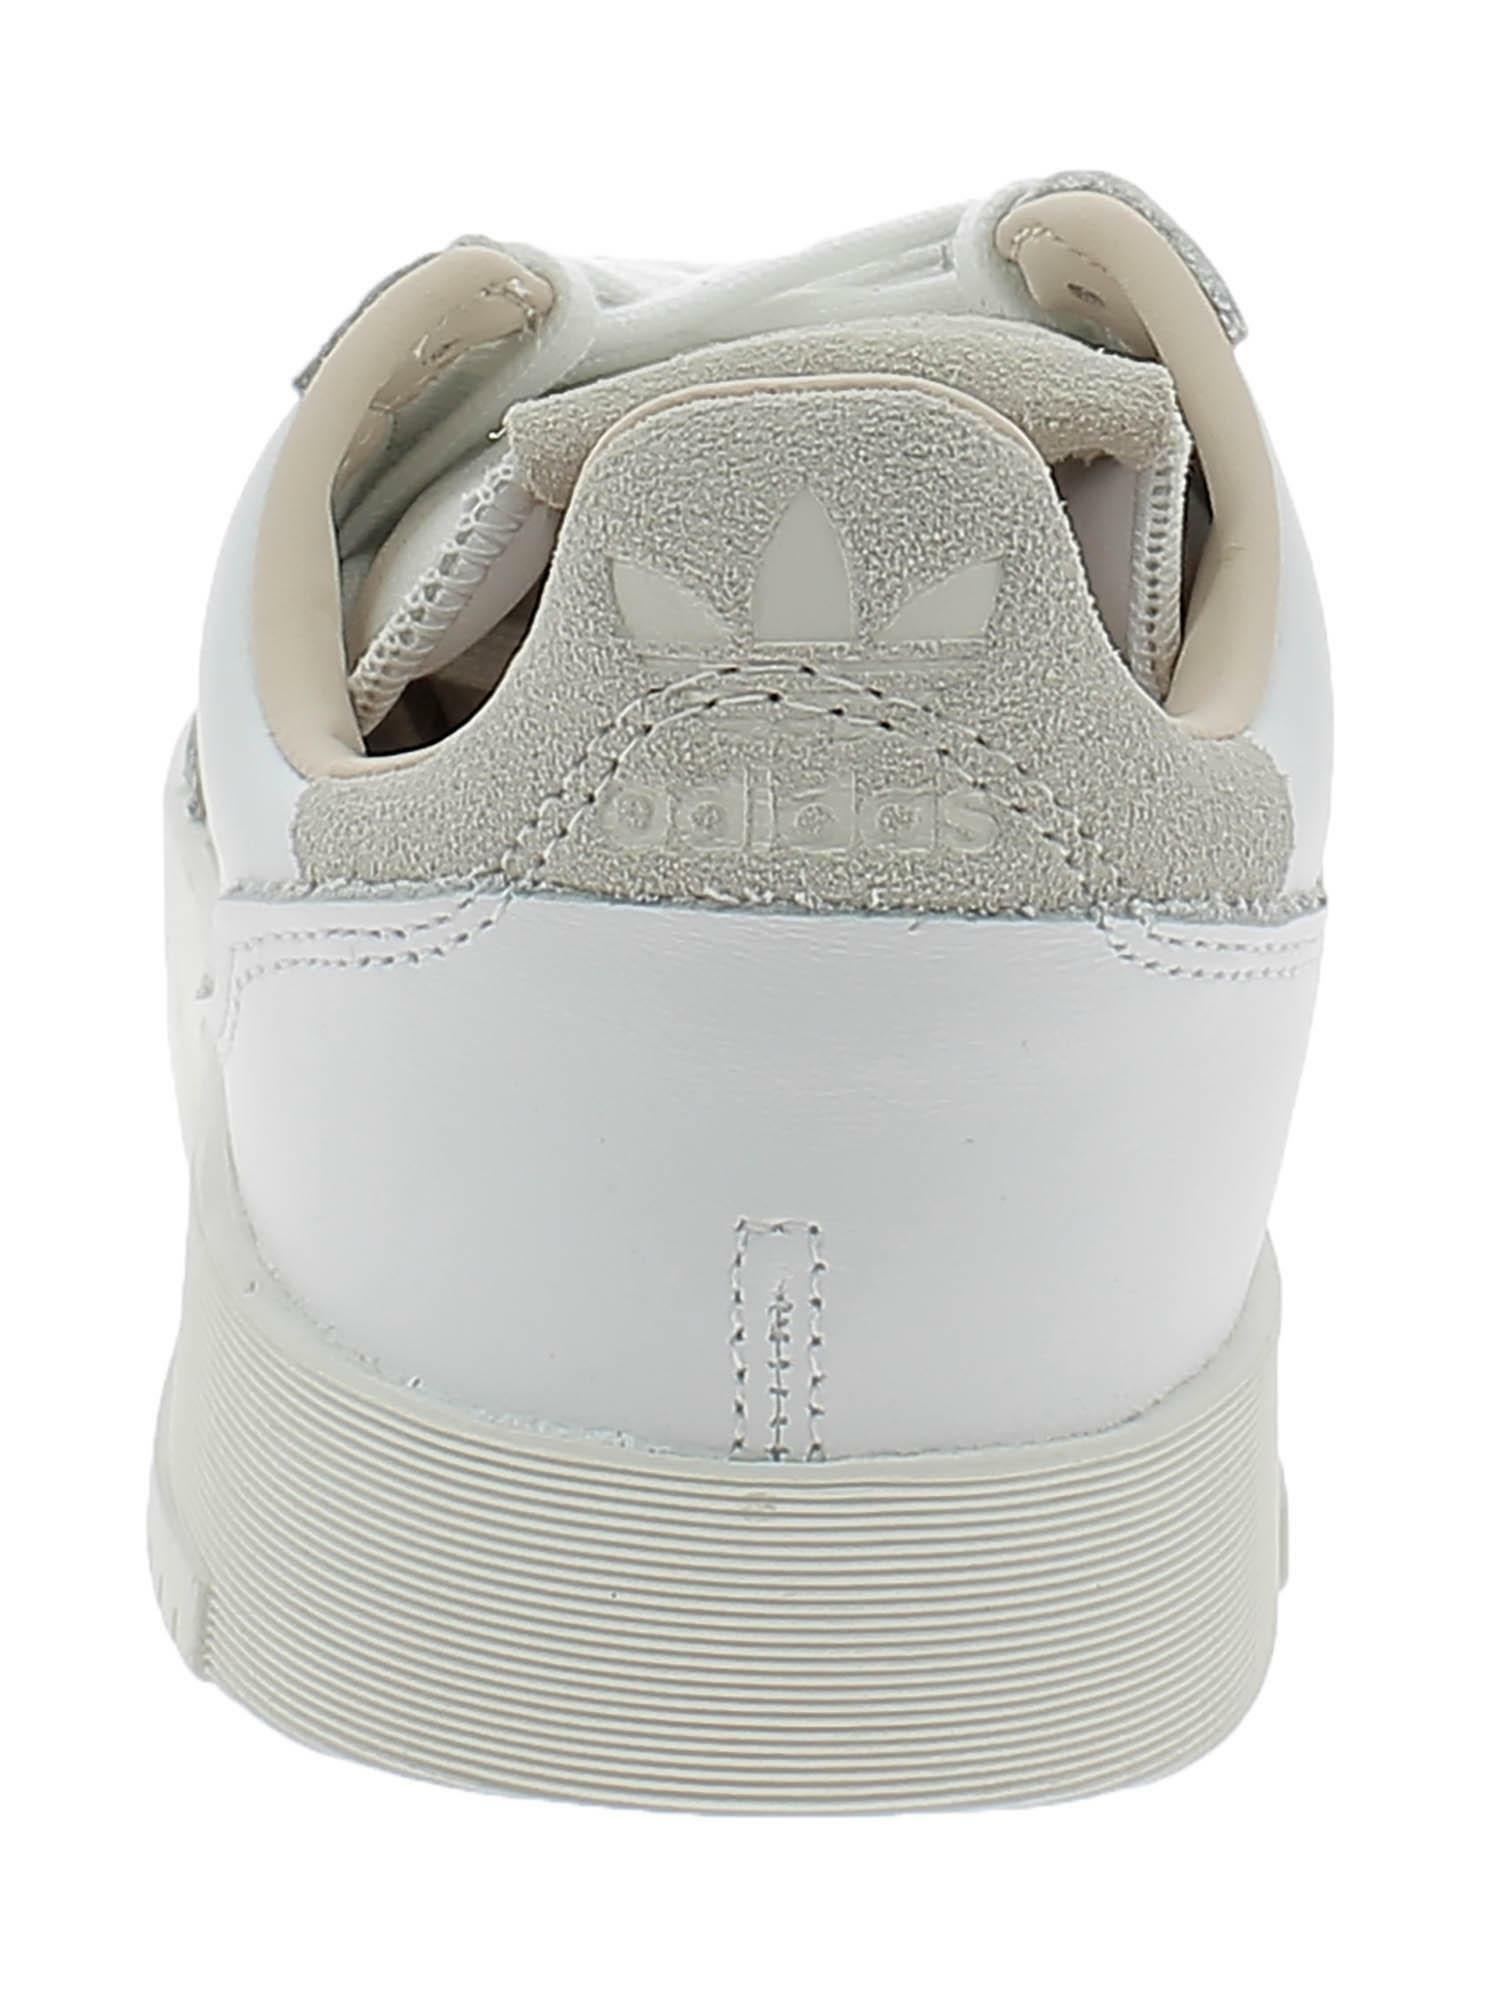 adidas adidas supercourt scarpe sportive uomo bianche ee6034